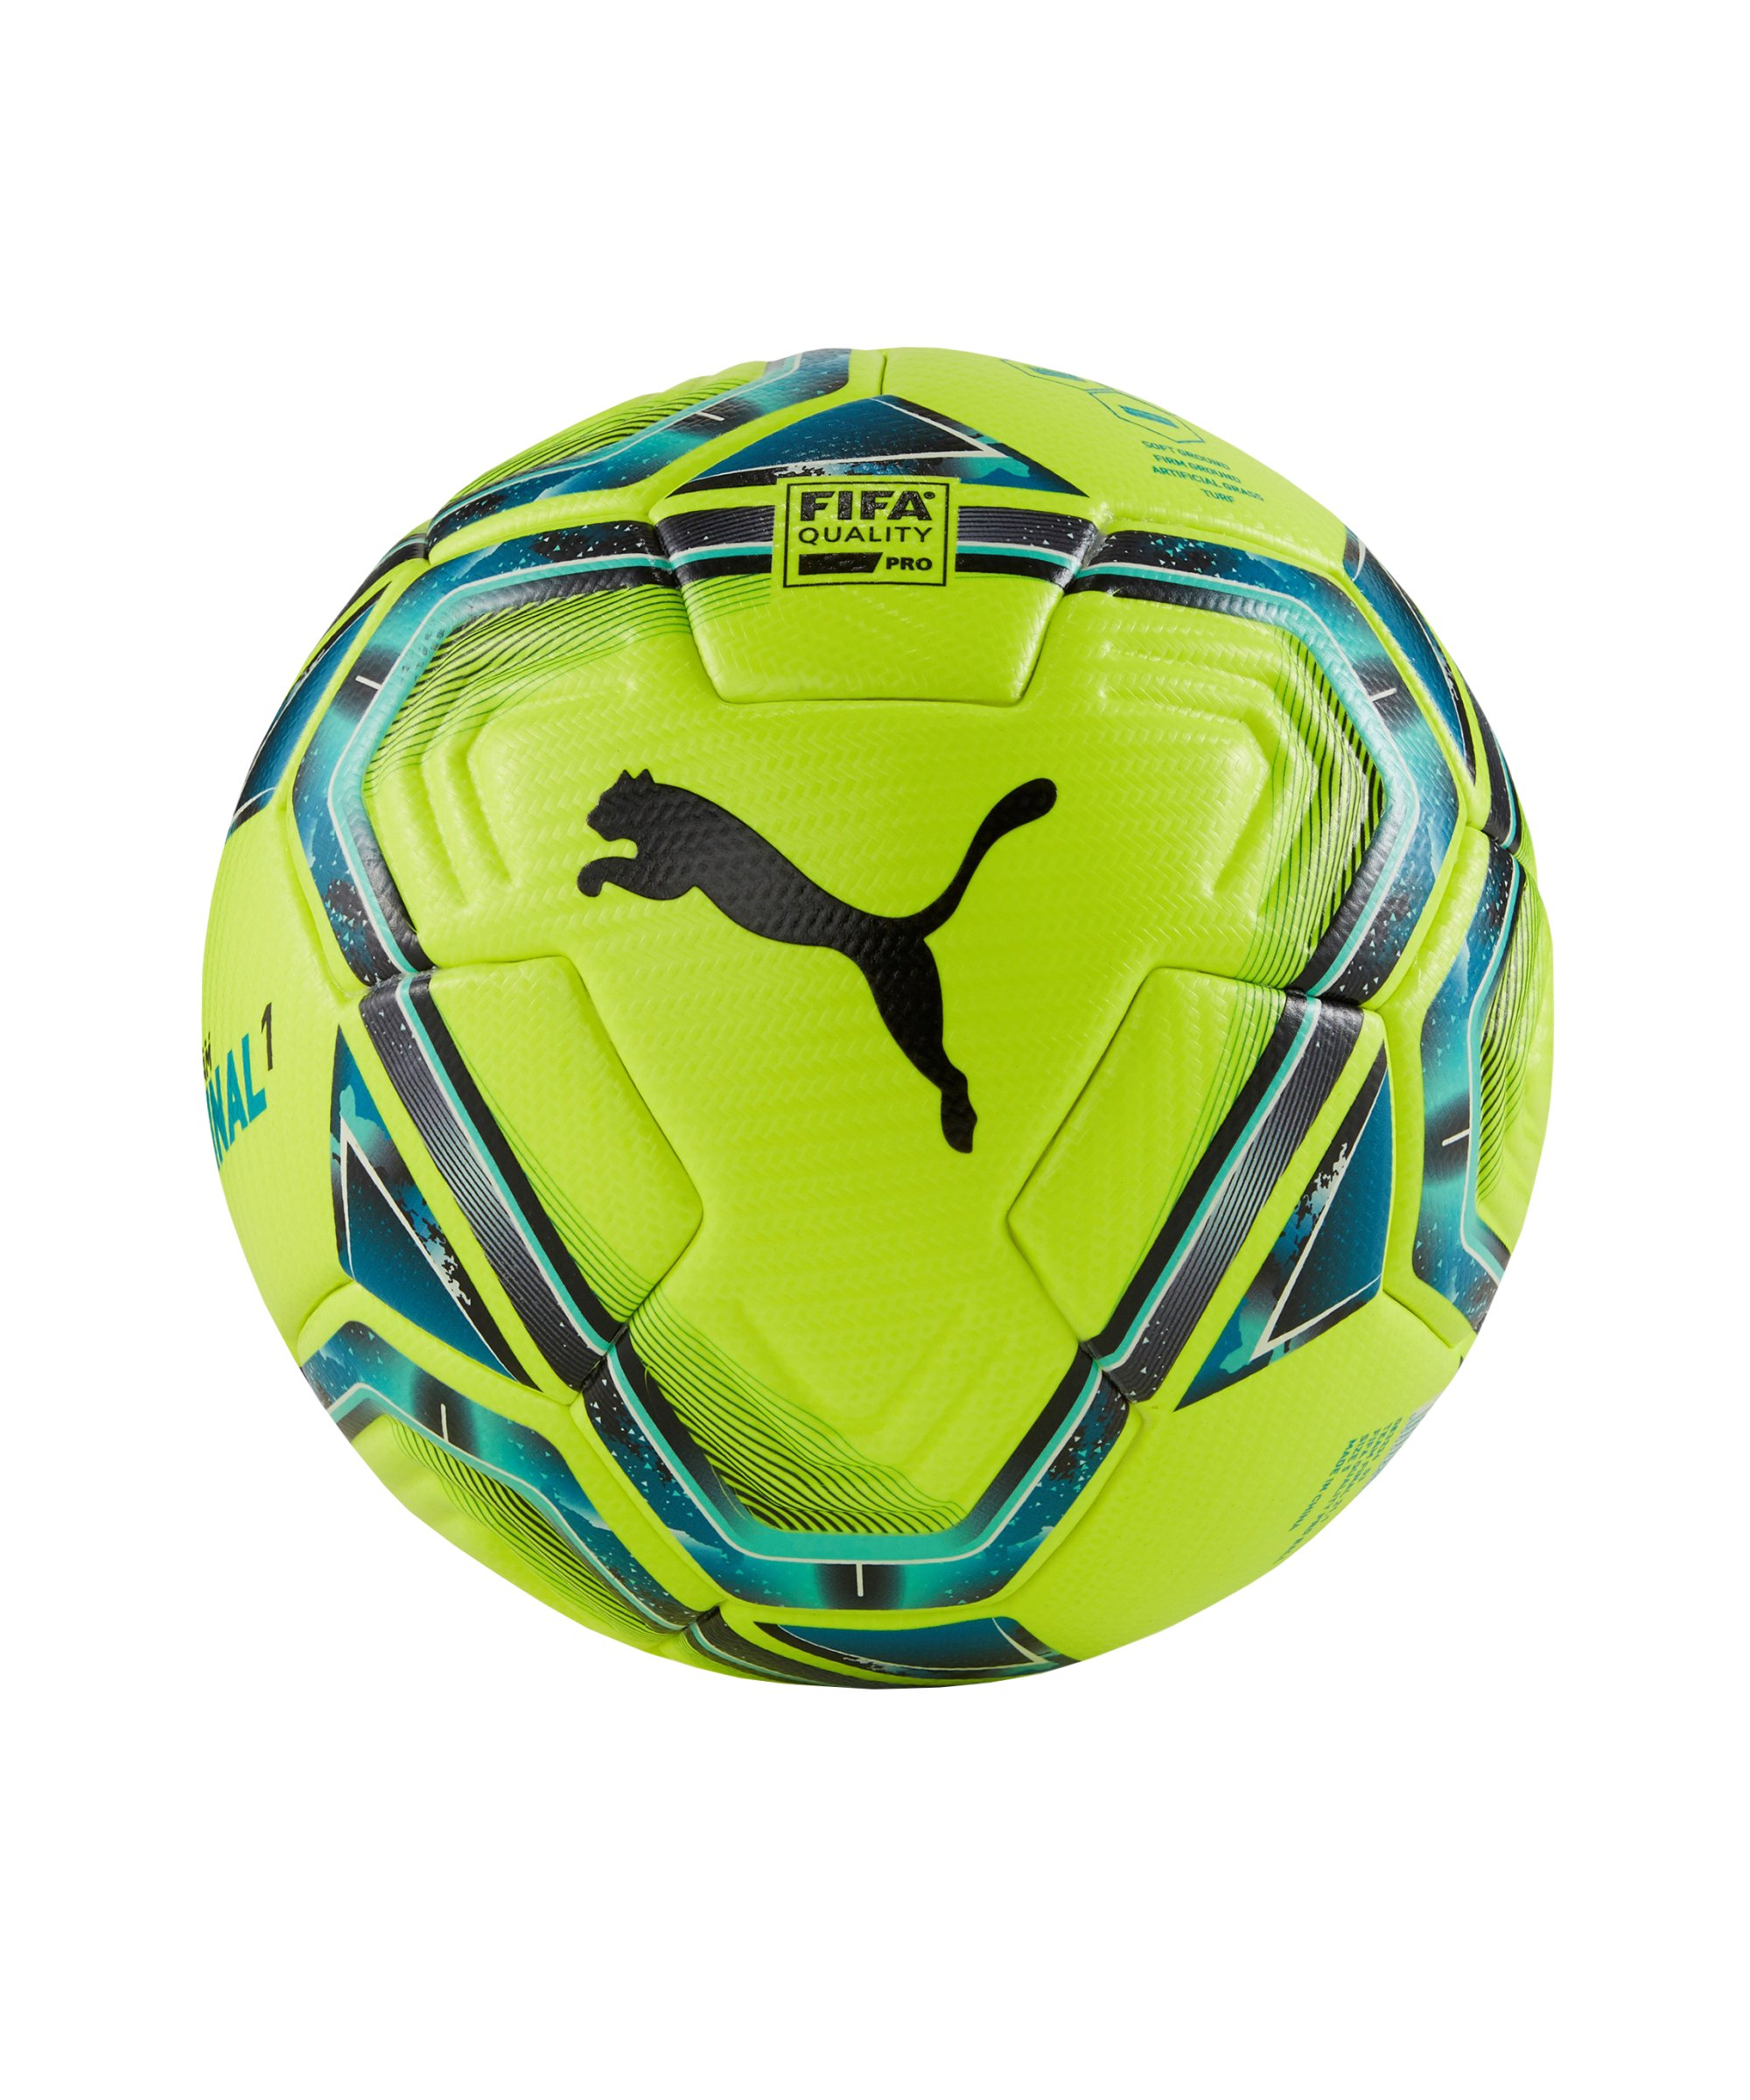 PUMA teamFINAL 21.1. FIFA Spielball Gr.5 F03 - gelb